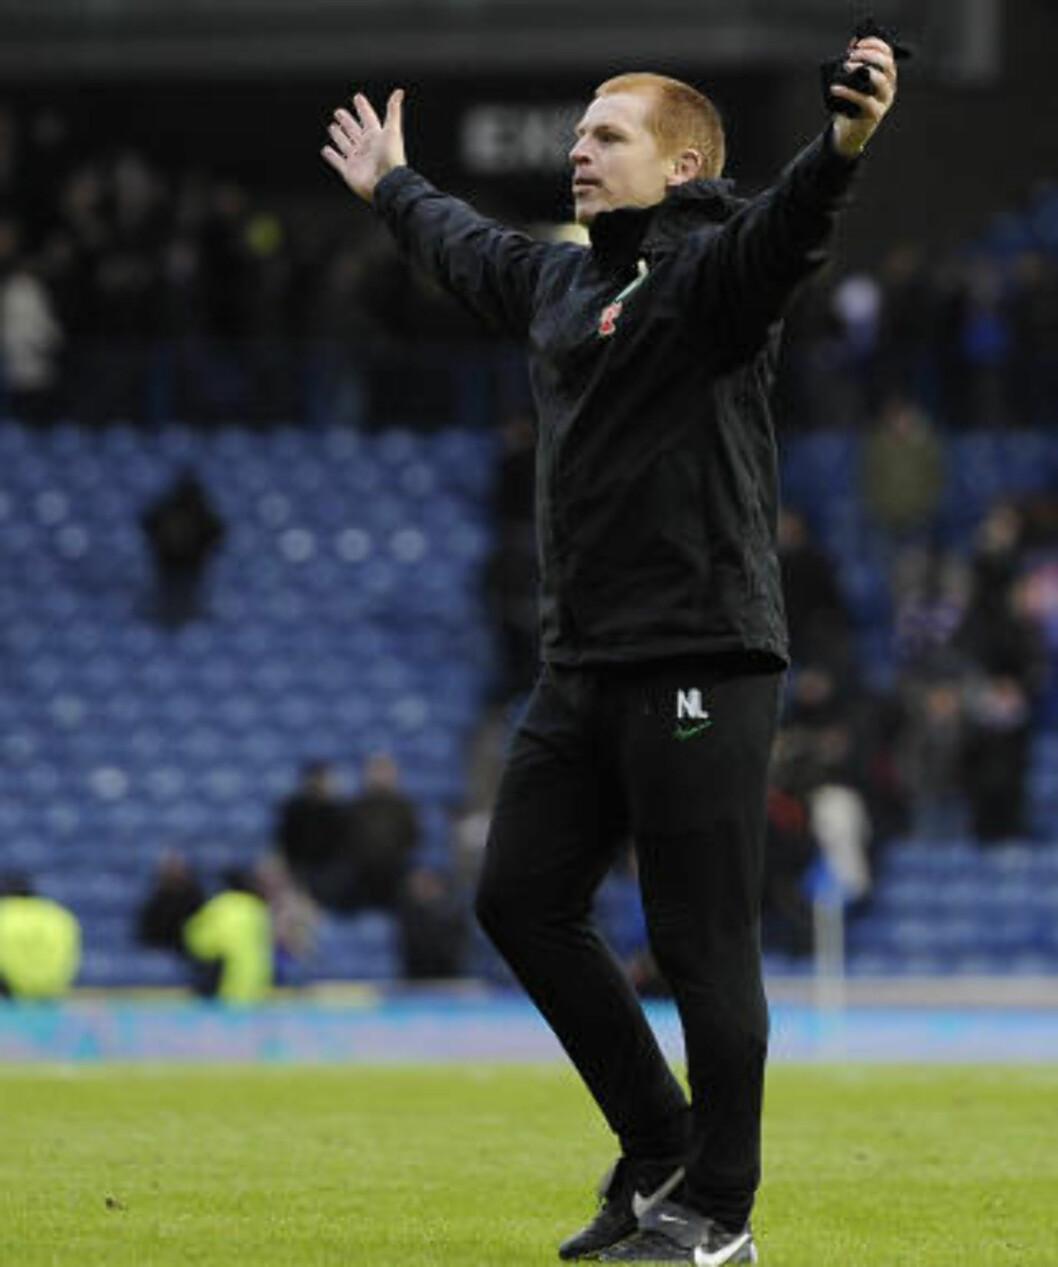 <strong>NY MANAGER:</strong> Celtic-legende Neil Lennon jubler for tre poeng. Foto: REUTERS/Russell Cheyne